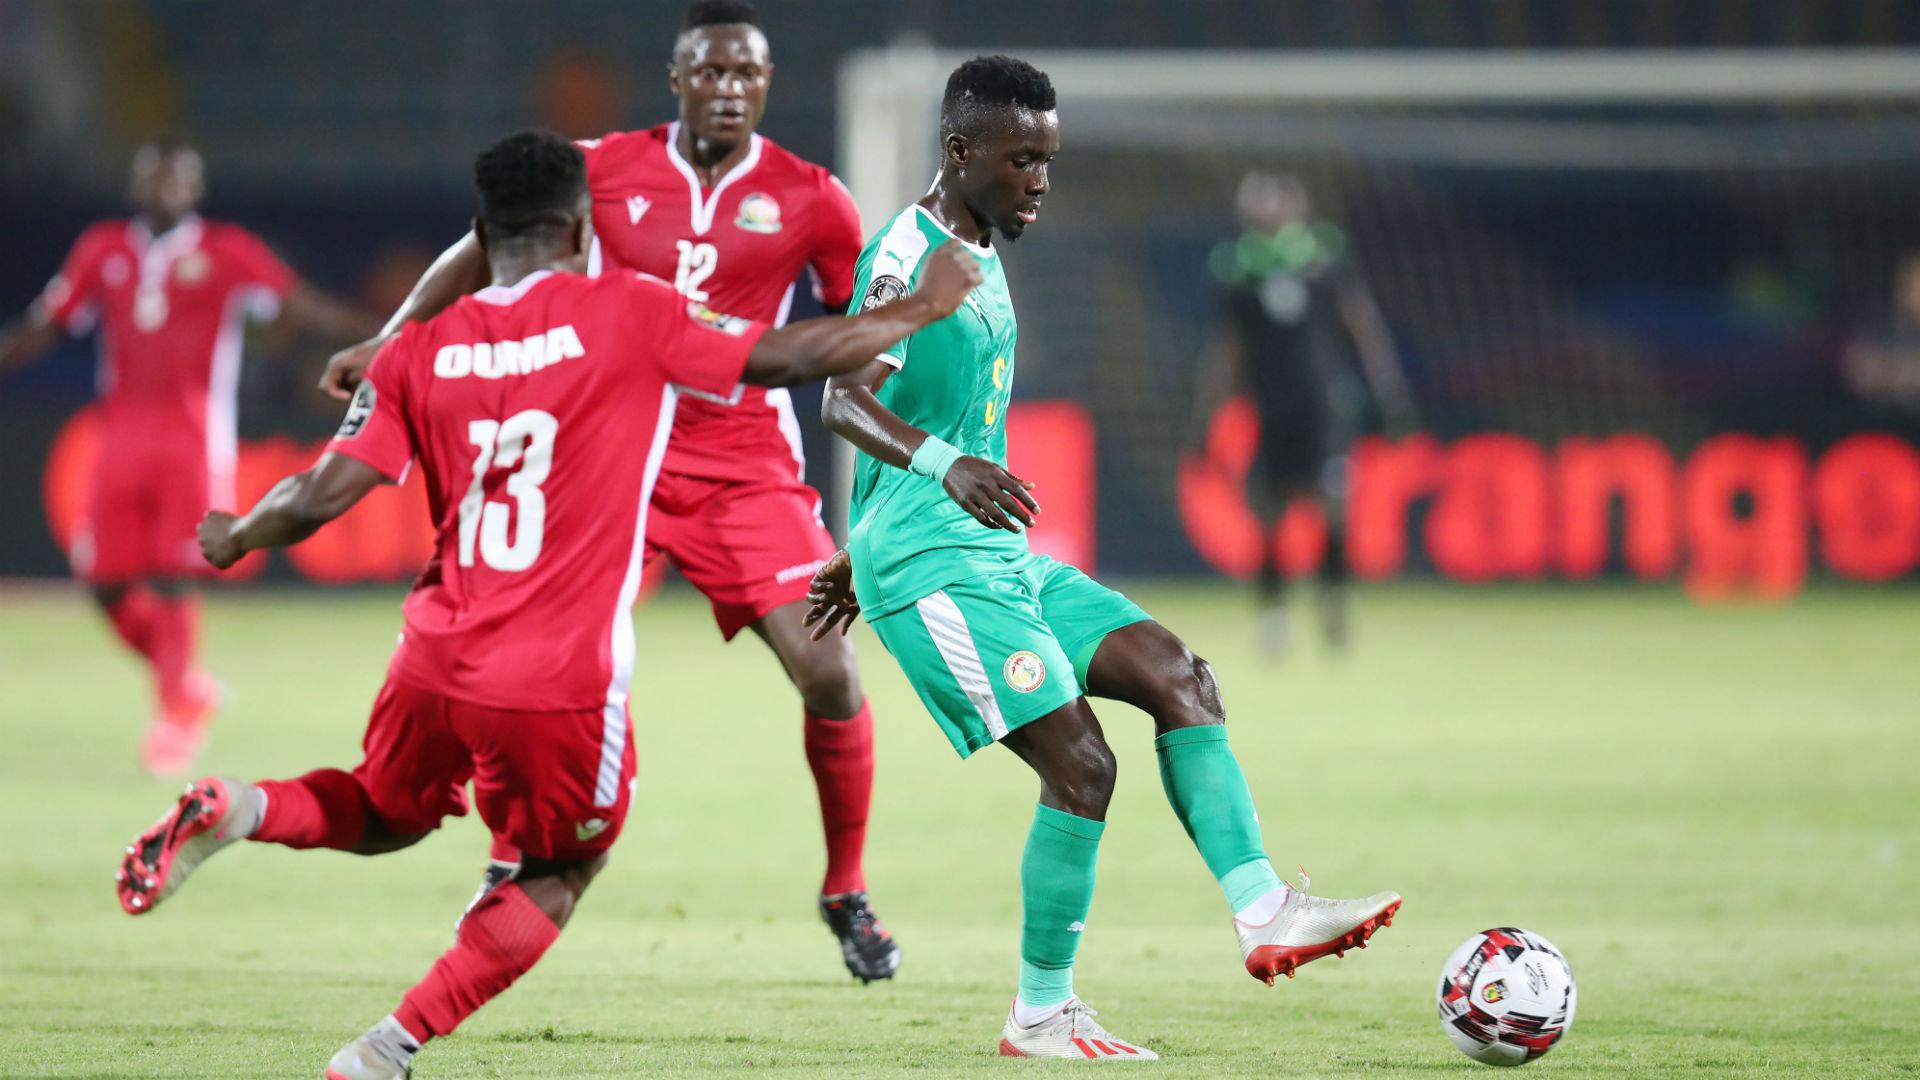 World Cup: Afcon experience vital for Harambee Stars' 2022 bid - Juma